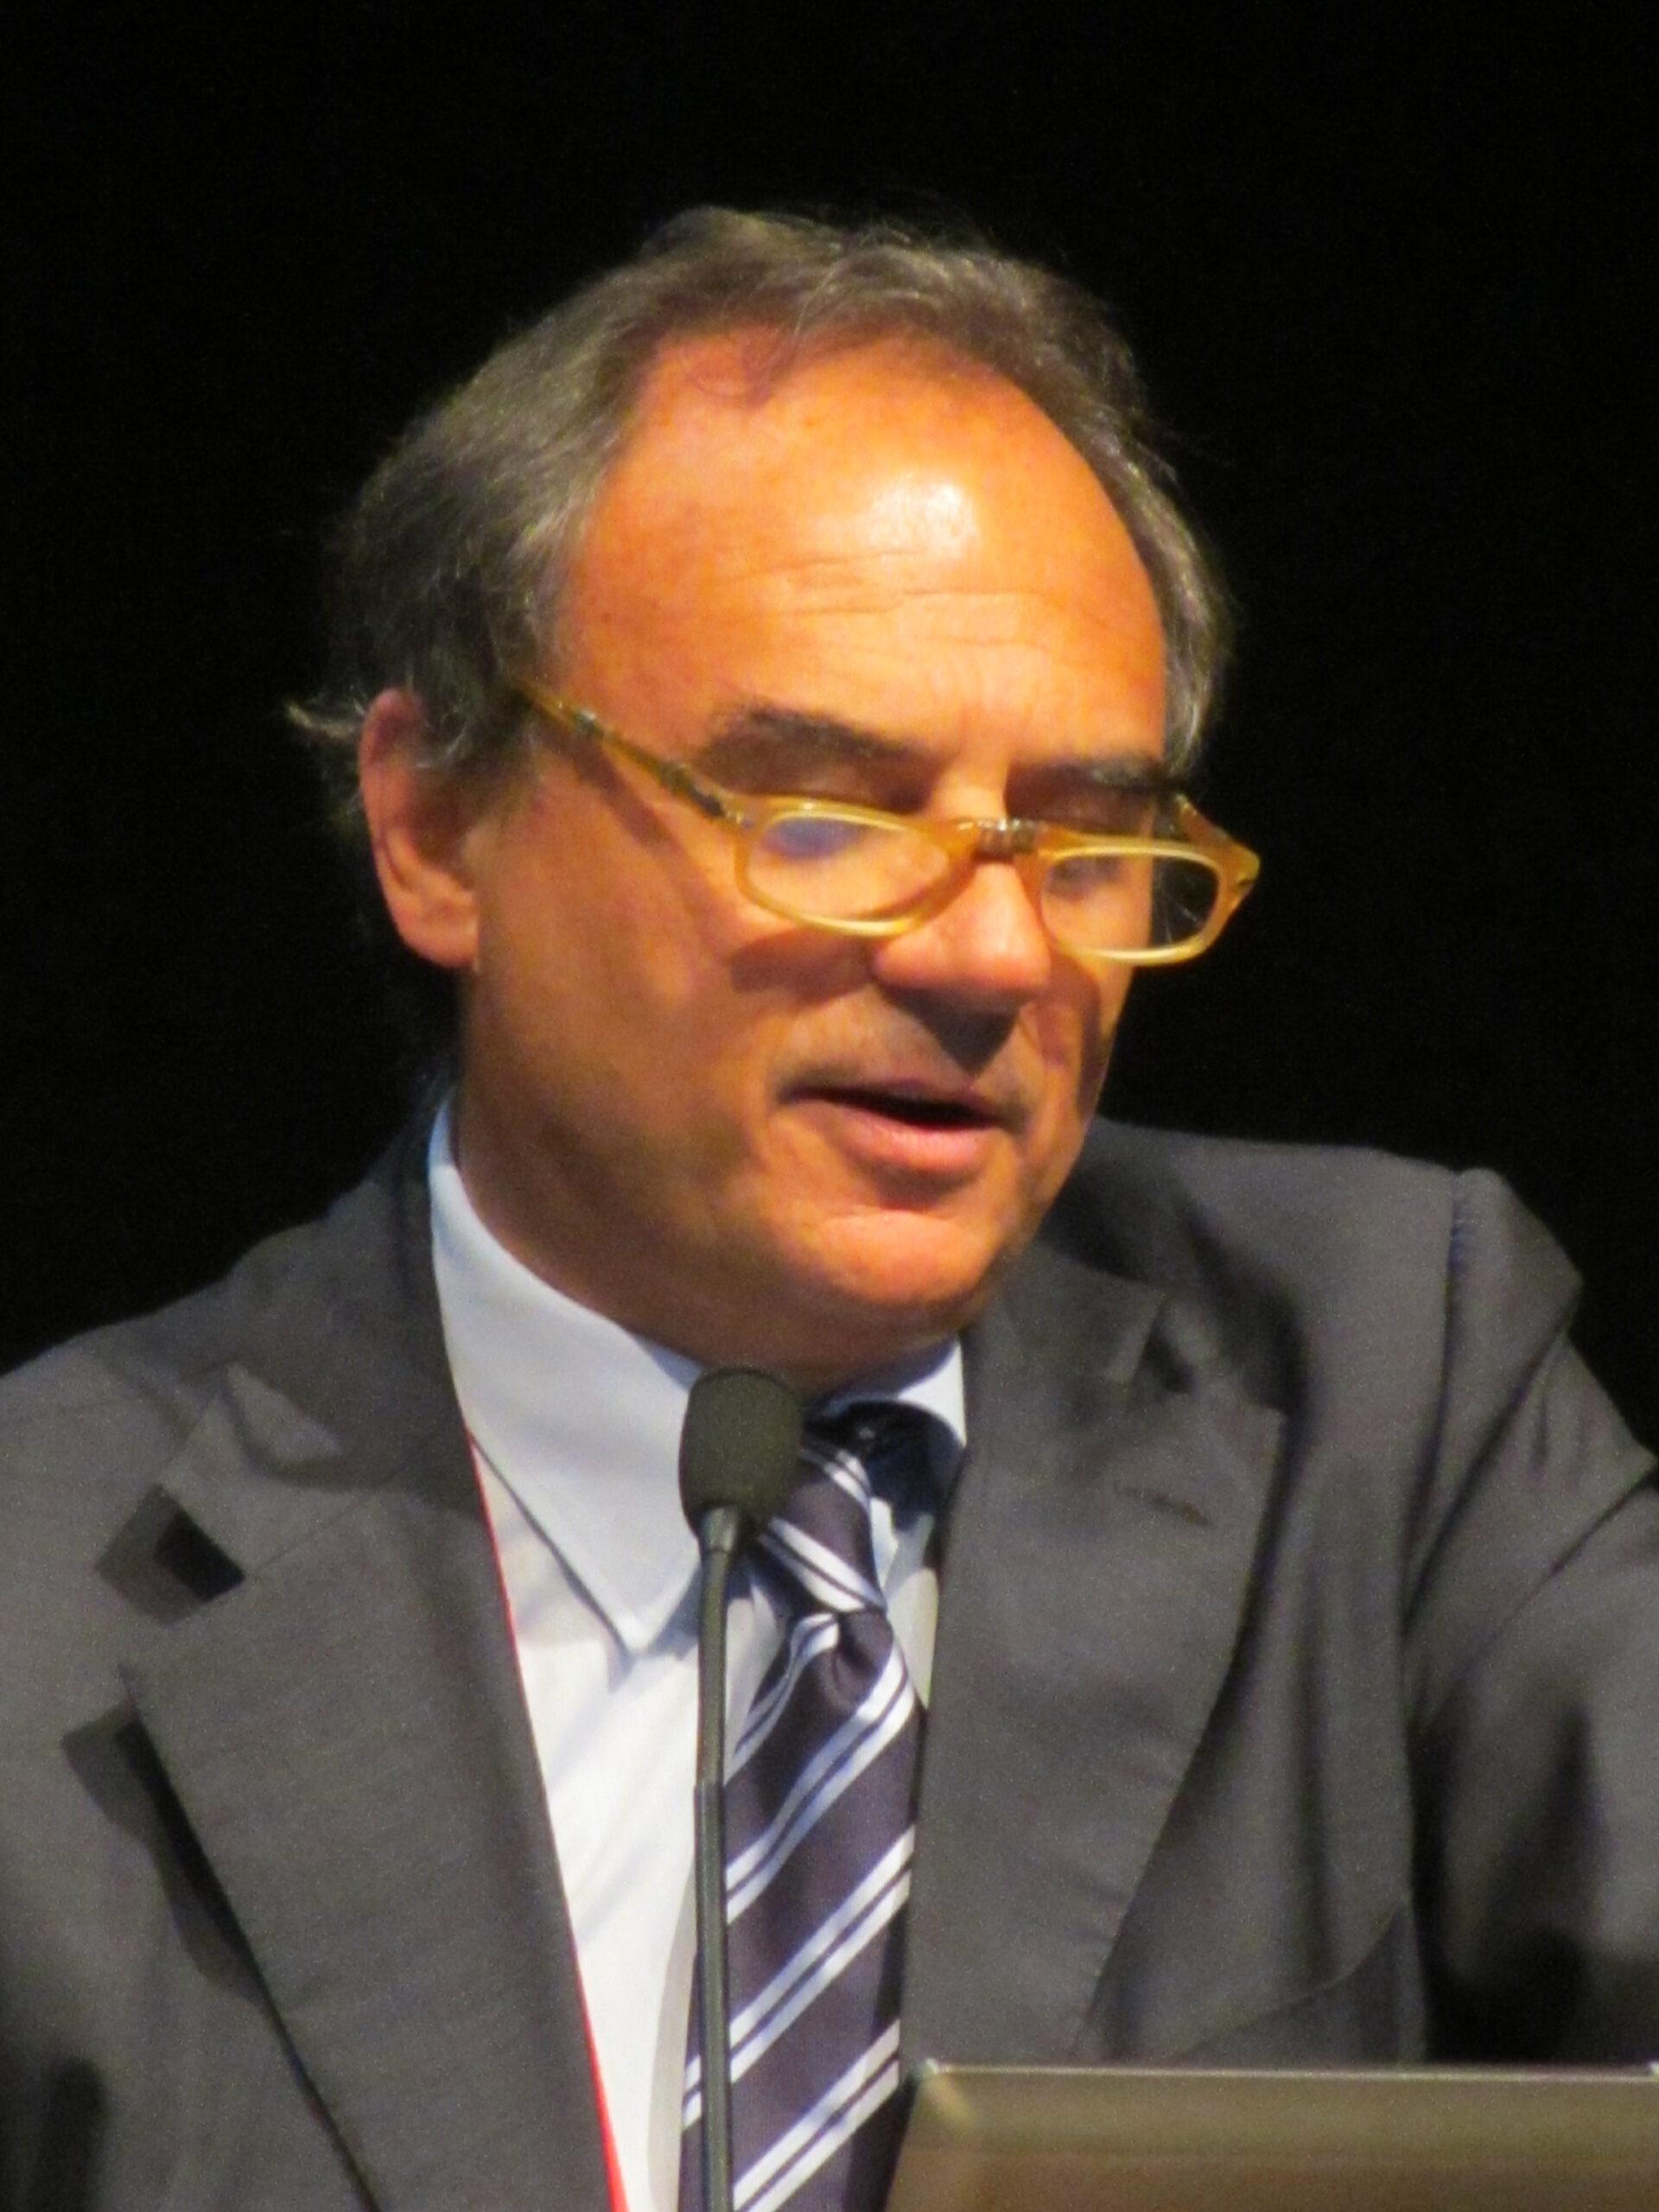 Stefano Nava - profile image